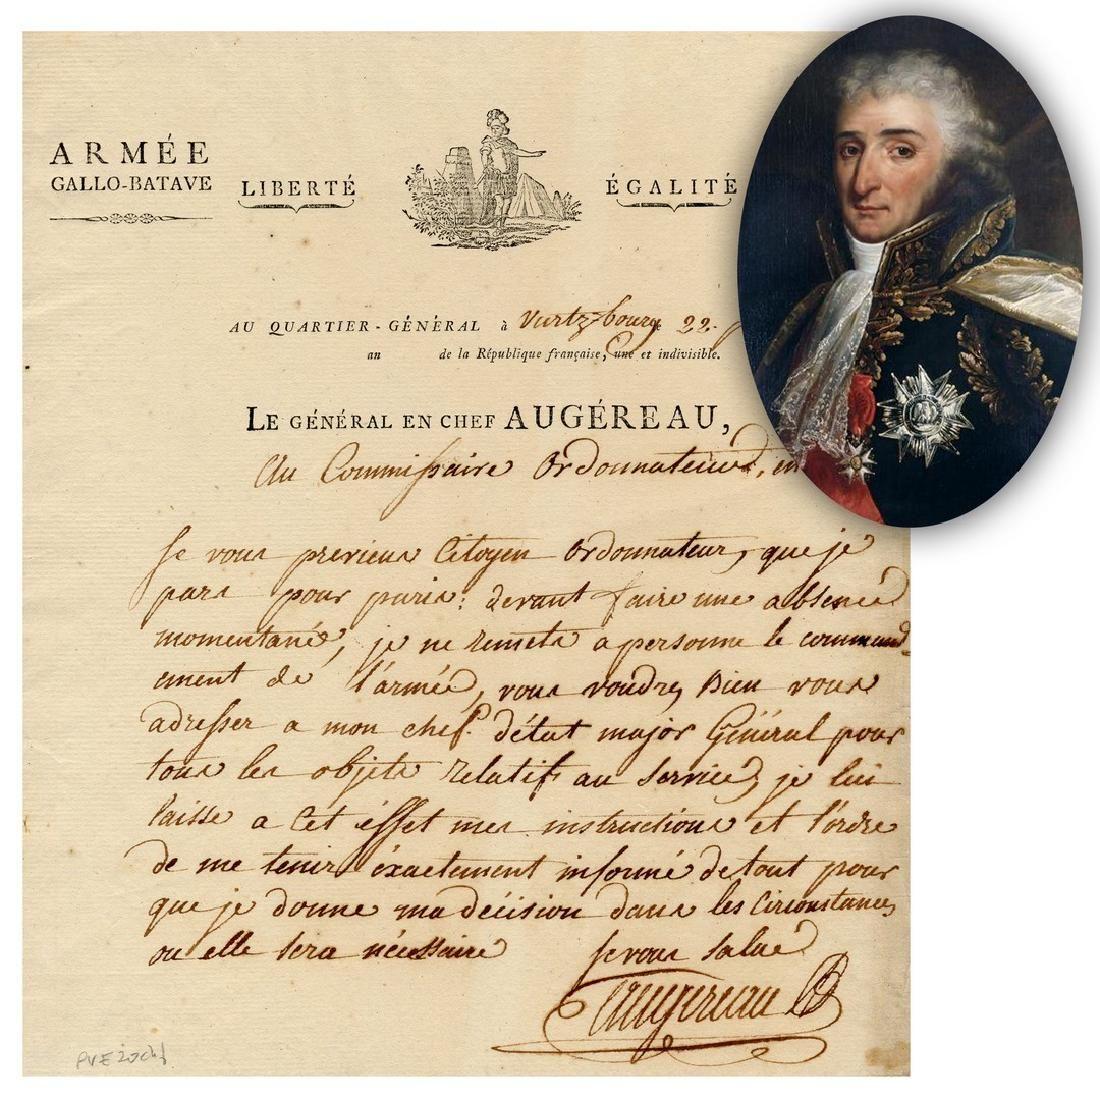 Napoleonic War General who Once Fled France after